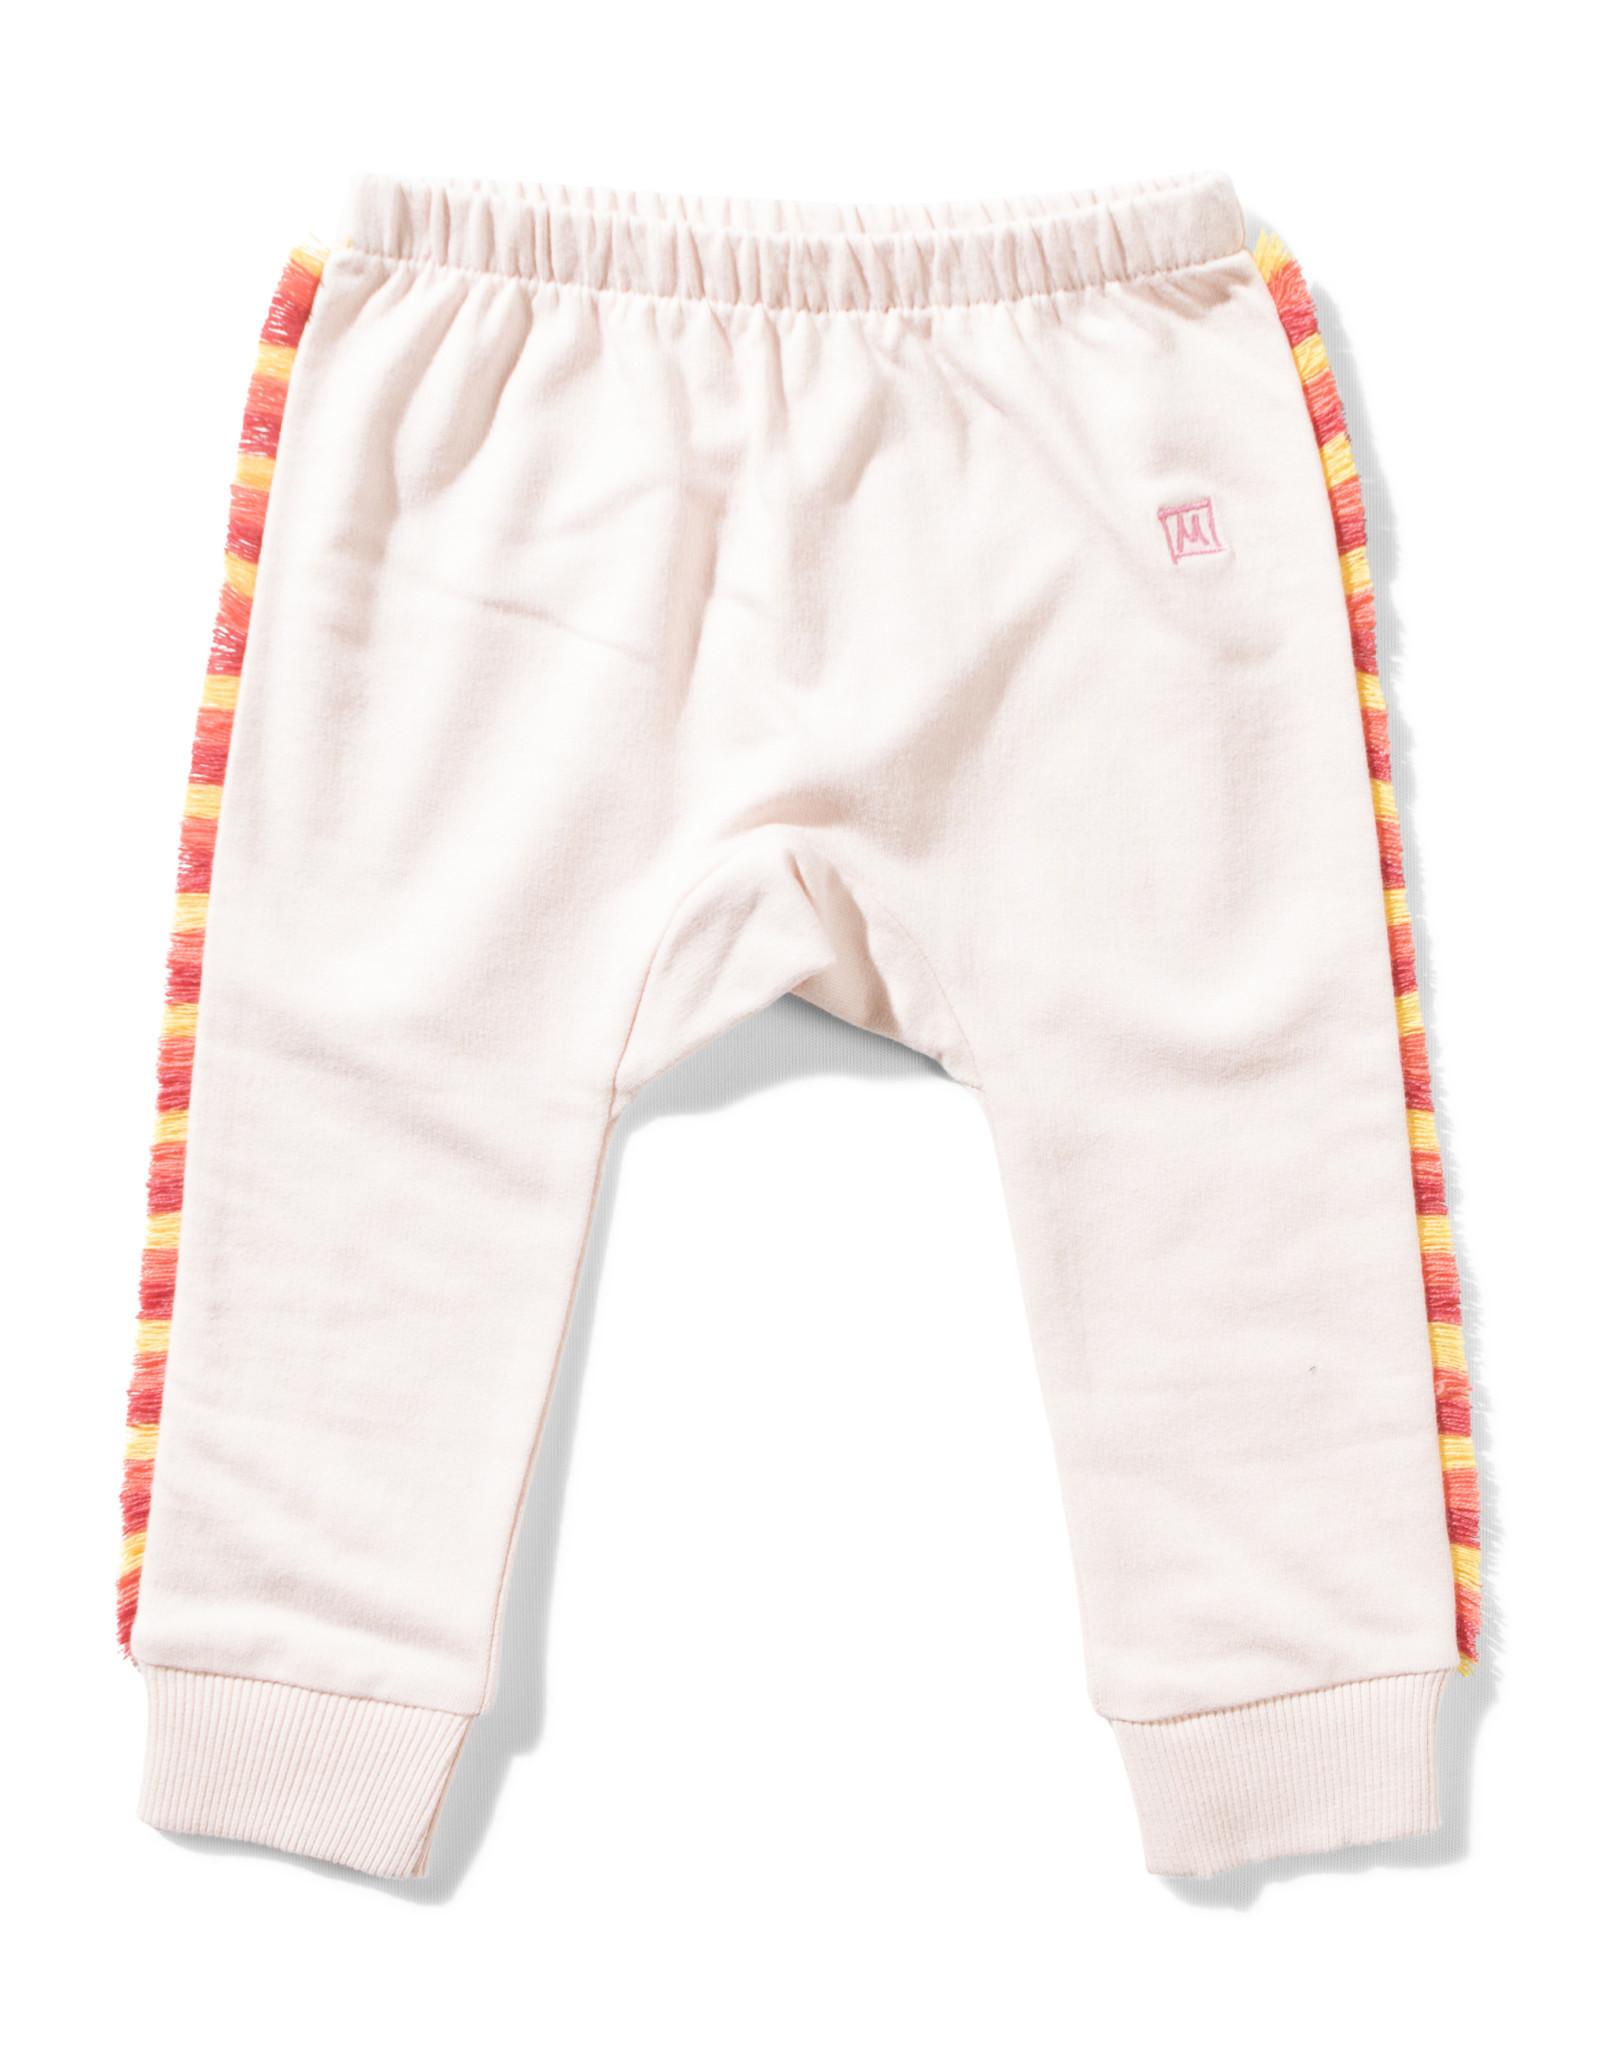 Munster Kids fancy pants- blush